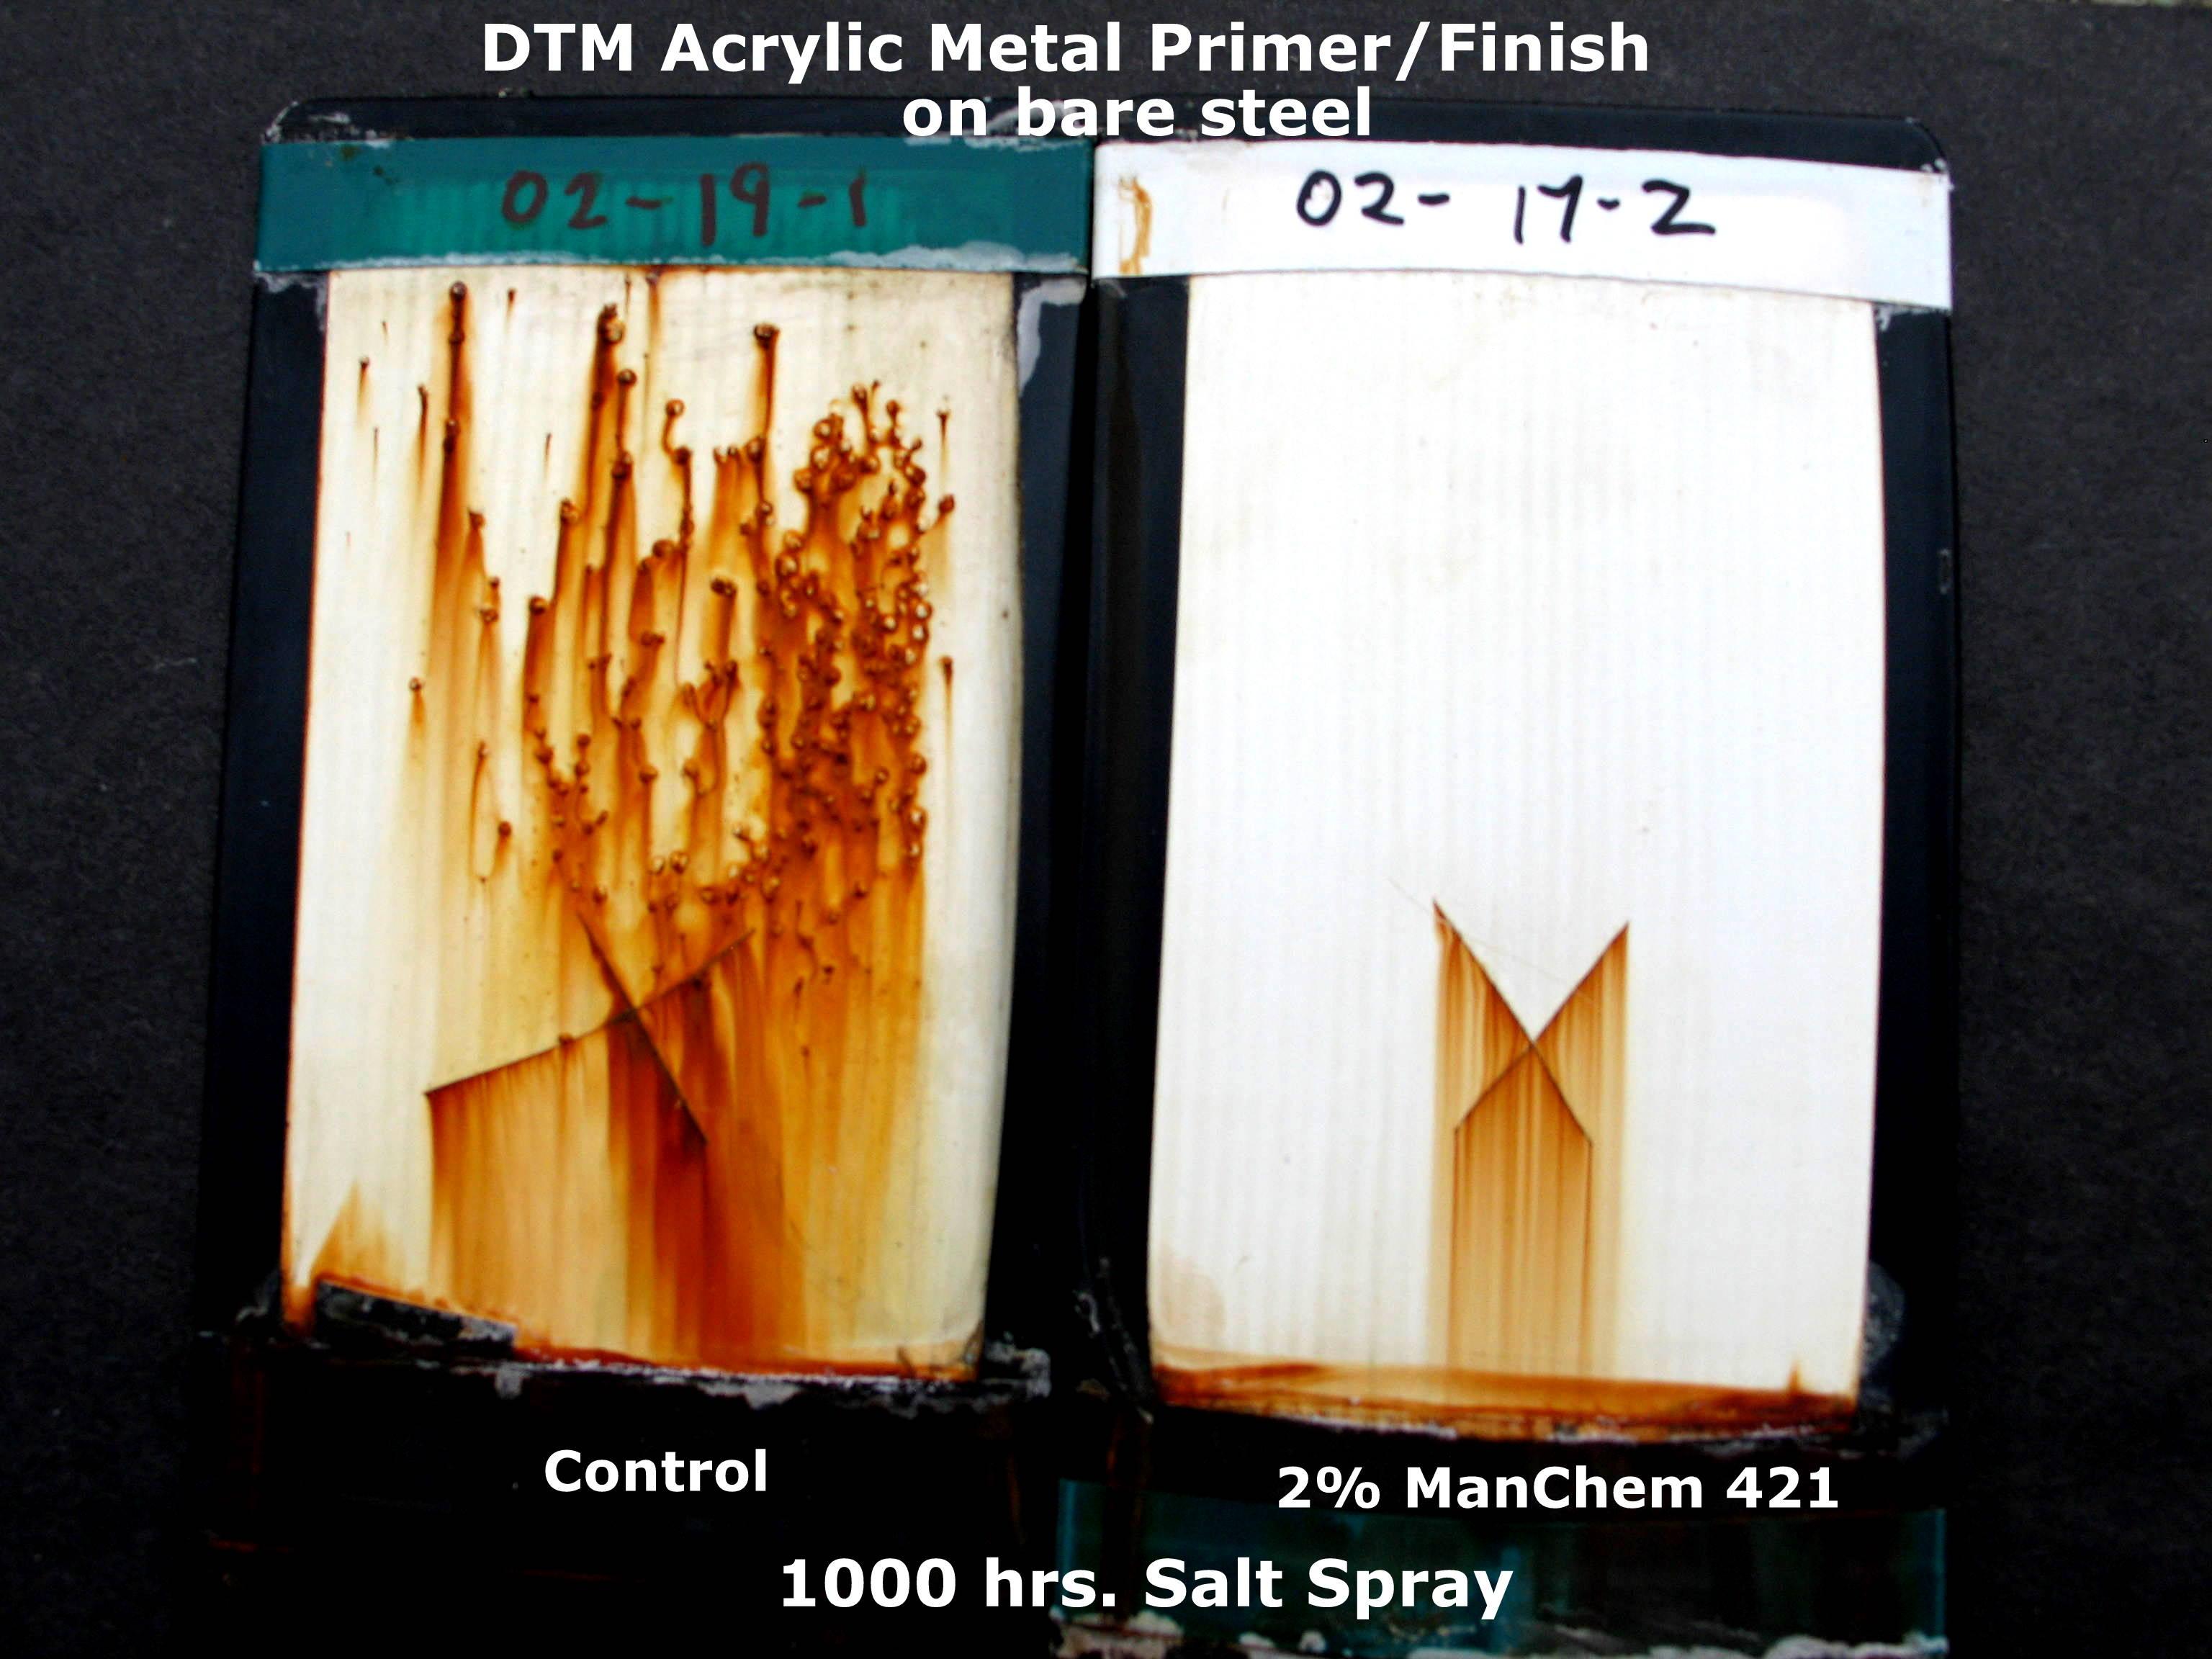 Salt spray test using DTM Acrylic Metal Primer/Finish on bare steel